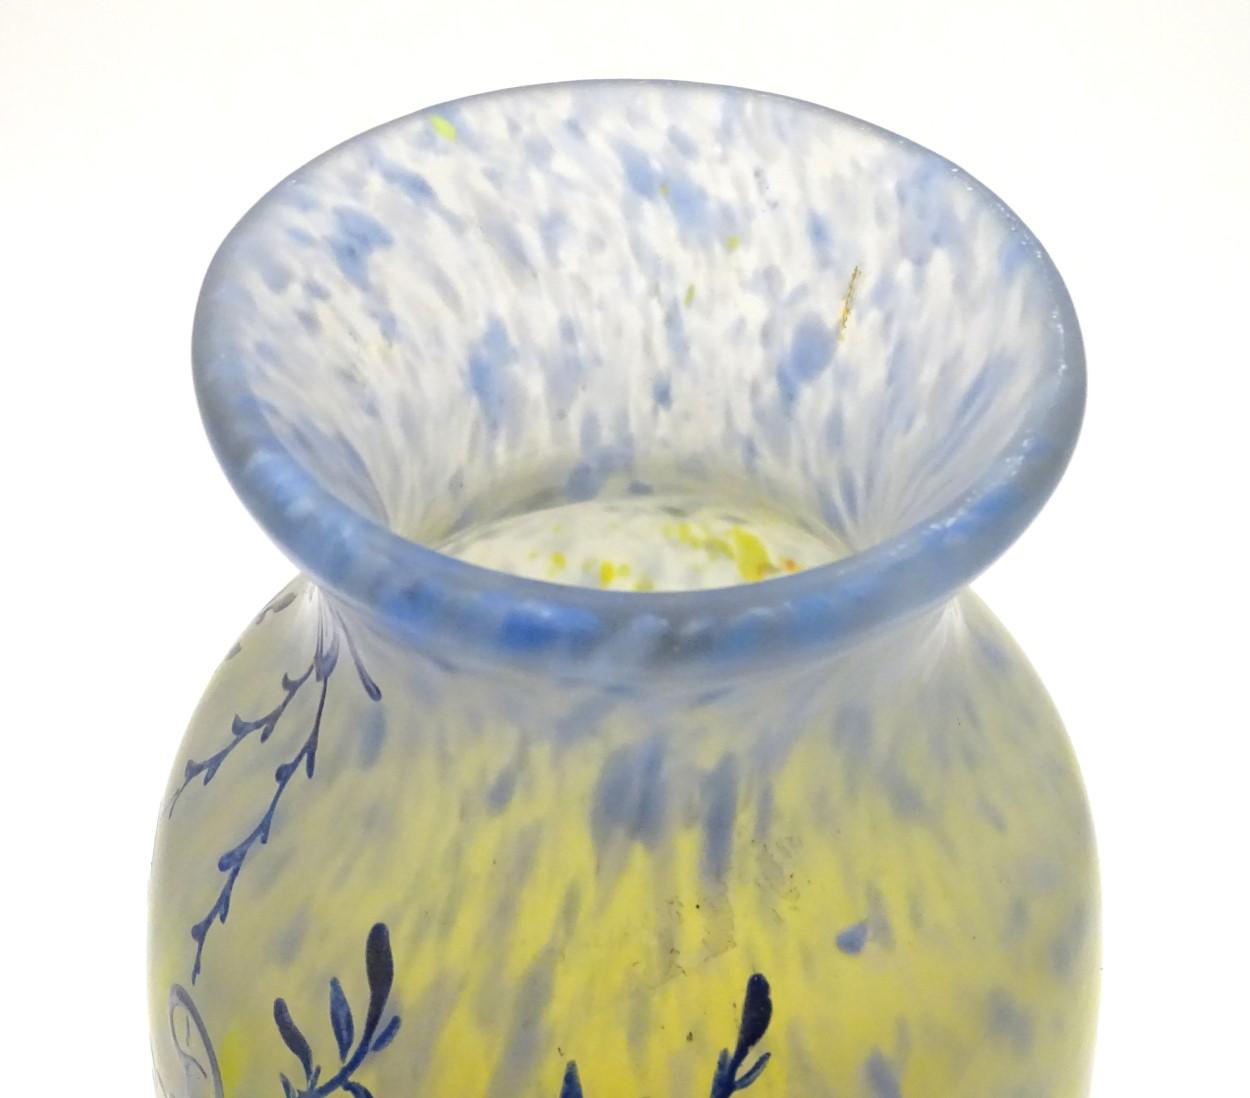 Lot 98 - Legras Printania vase: A François-Théodore Legras (1839-1916),